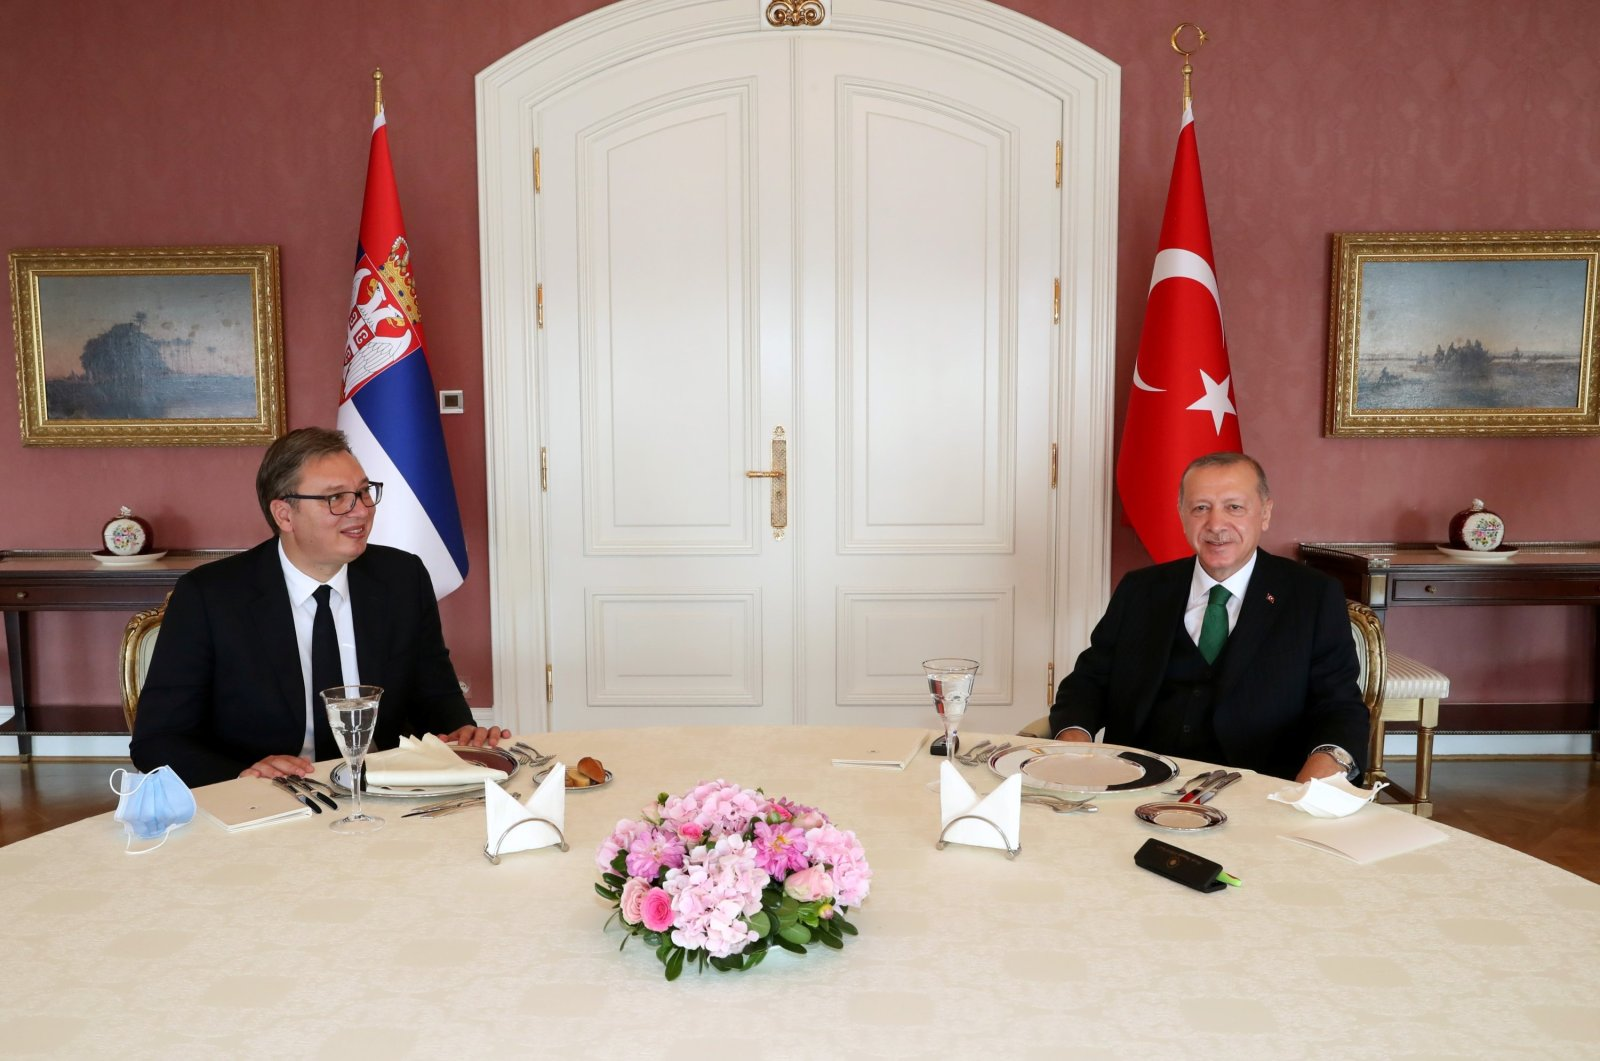 President Recep Tayyip Erdoğan (R) meets with his Serbian counterpart Aleksandar Vucic in Istanbul, Turkey, Sept. 25, 2020. (Reuters Photo)